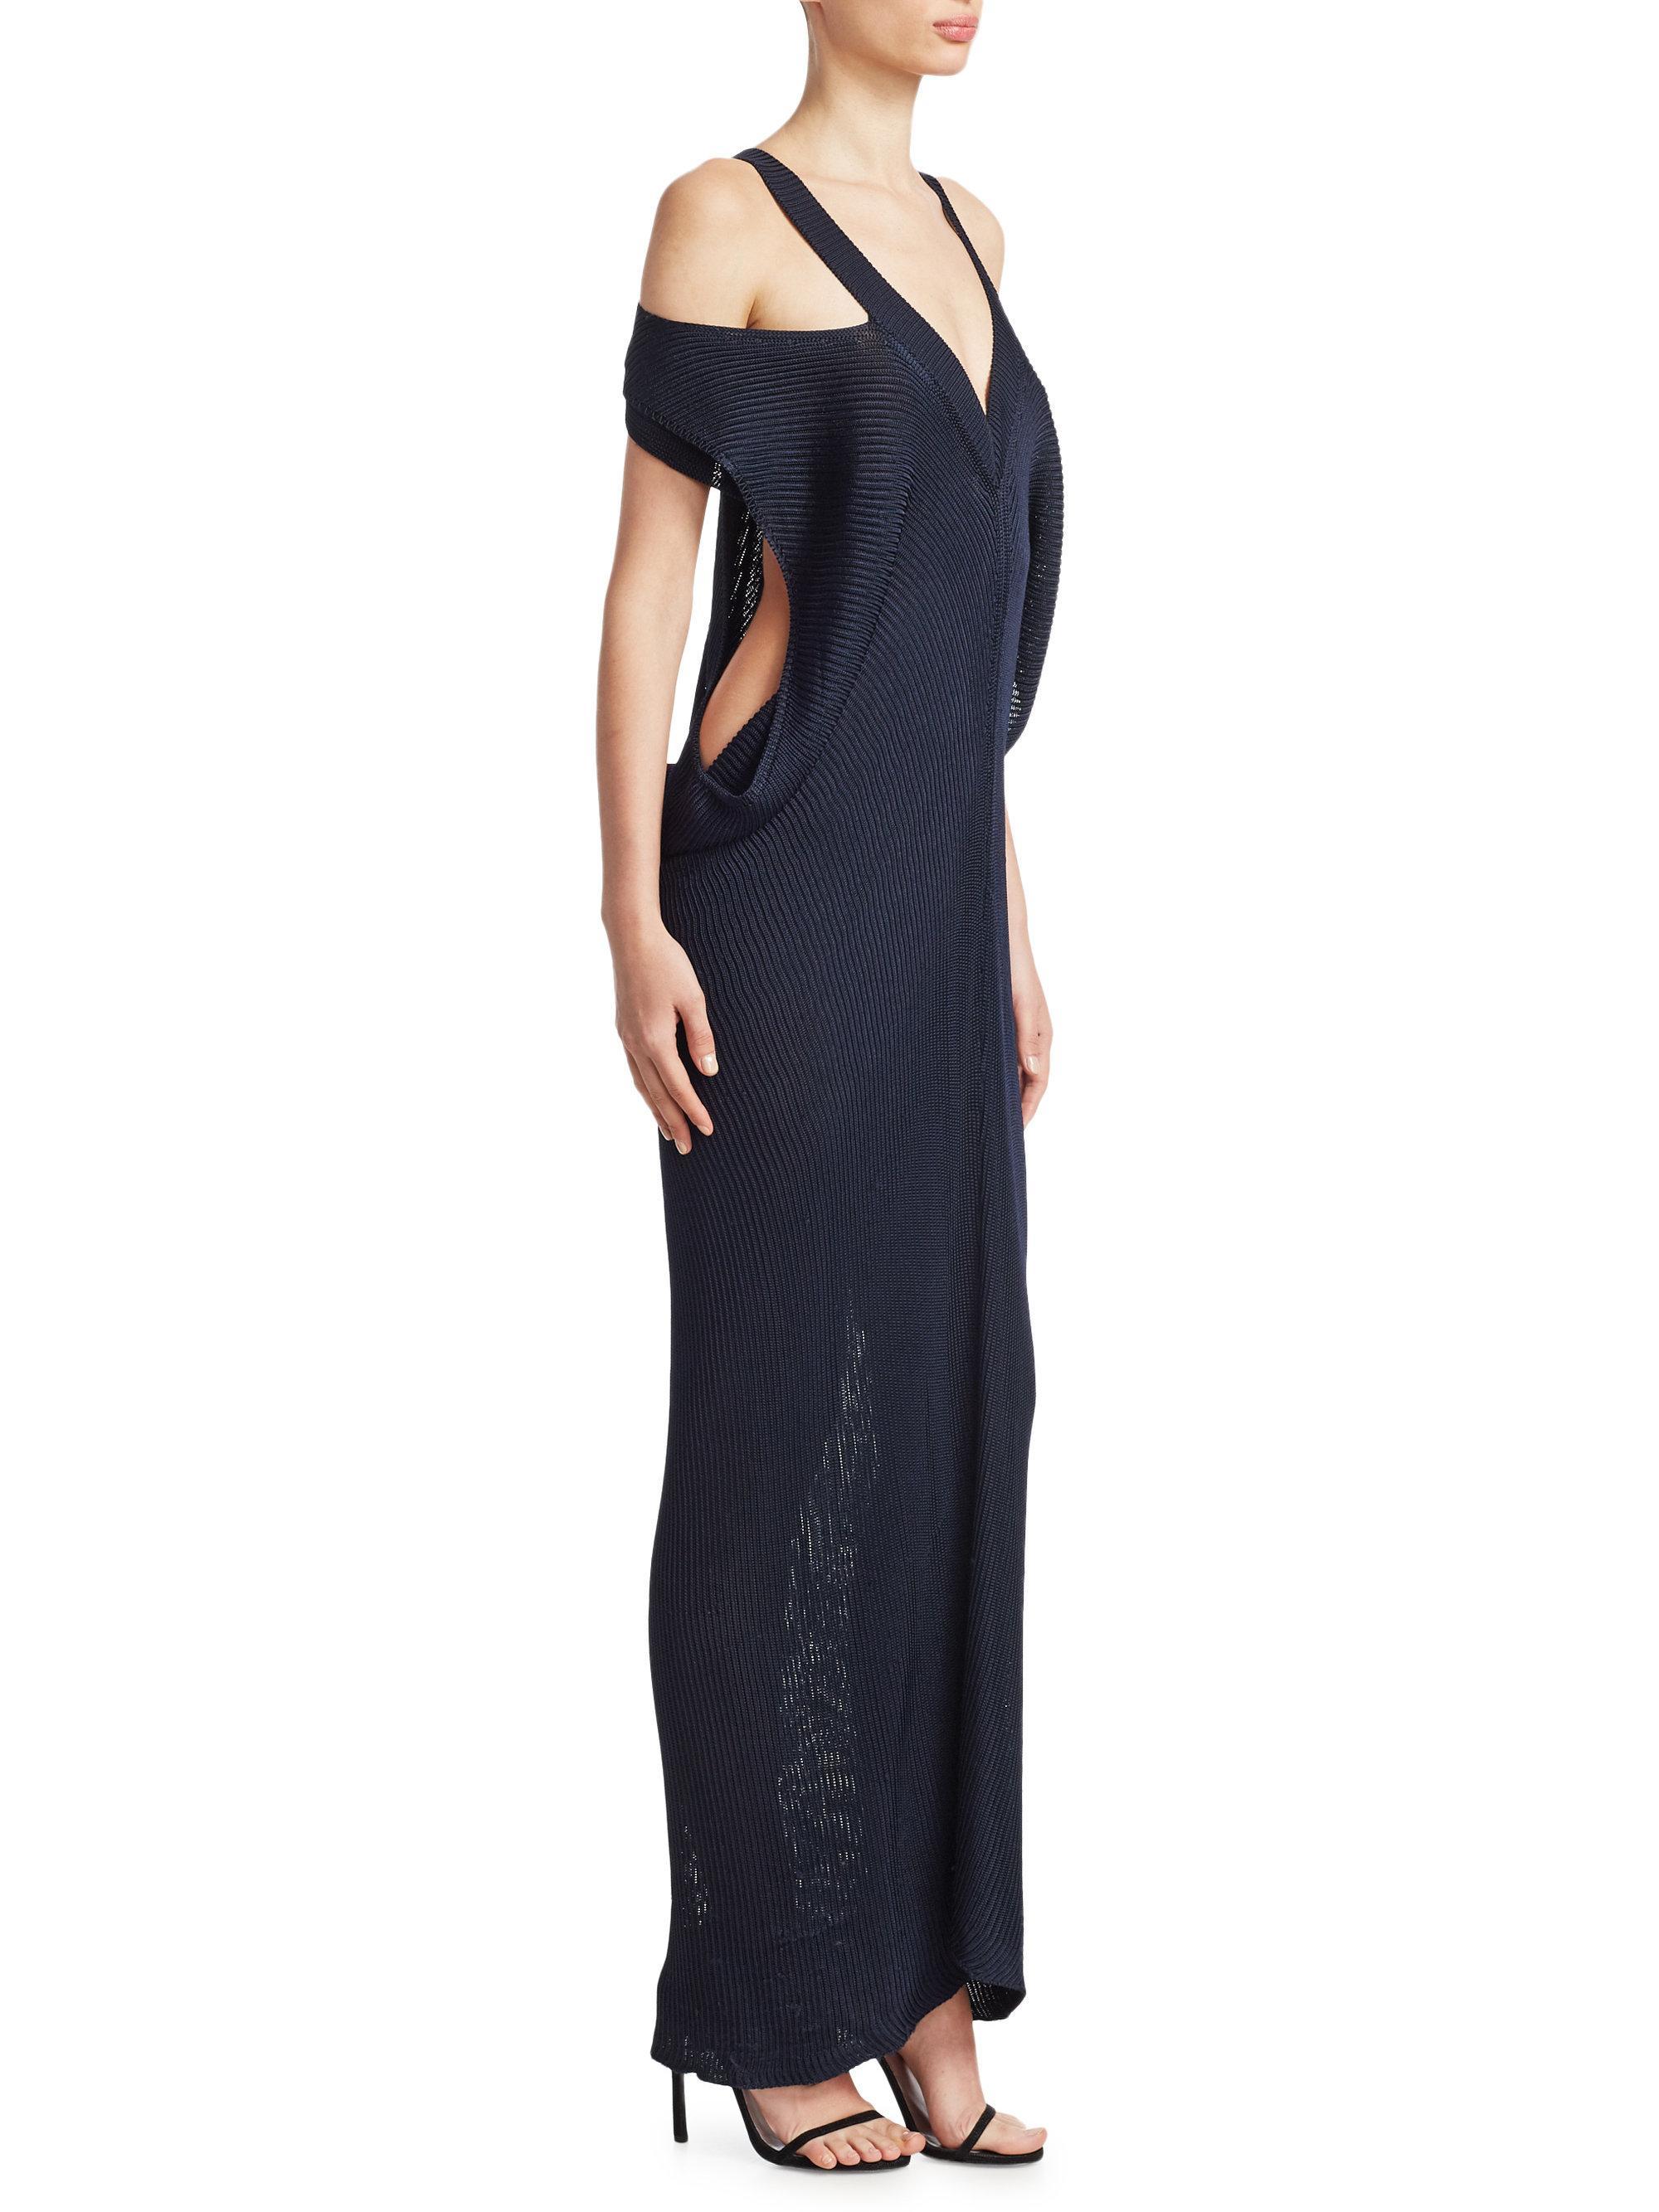 Ribbed knit dress Roberto Cavalli Explore For Sale Clearance New 2GjeS